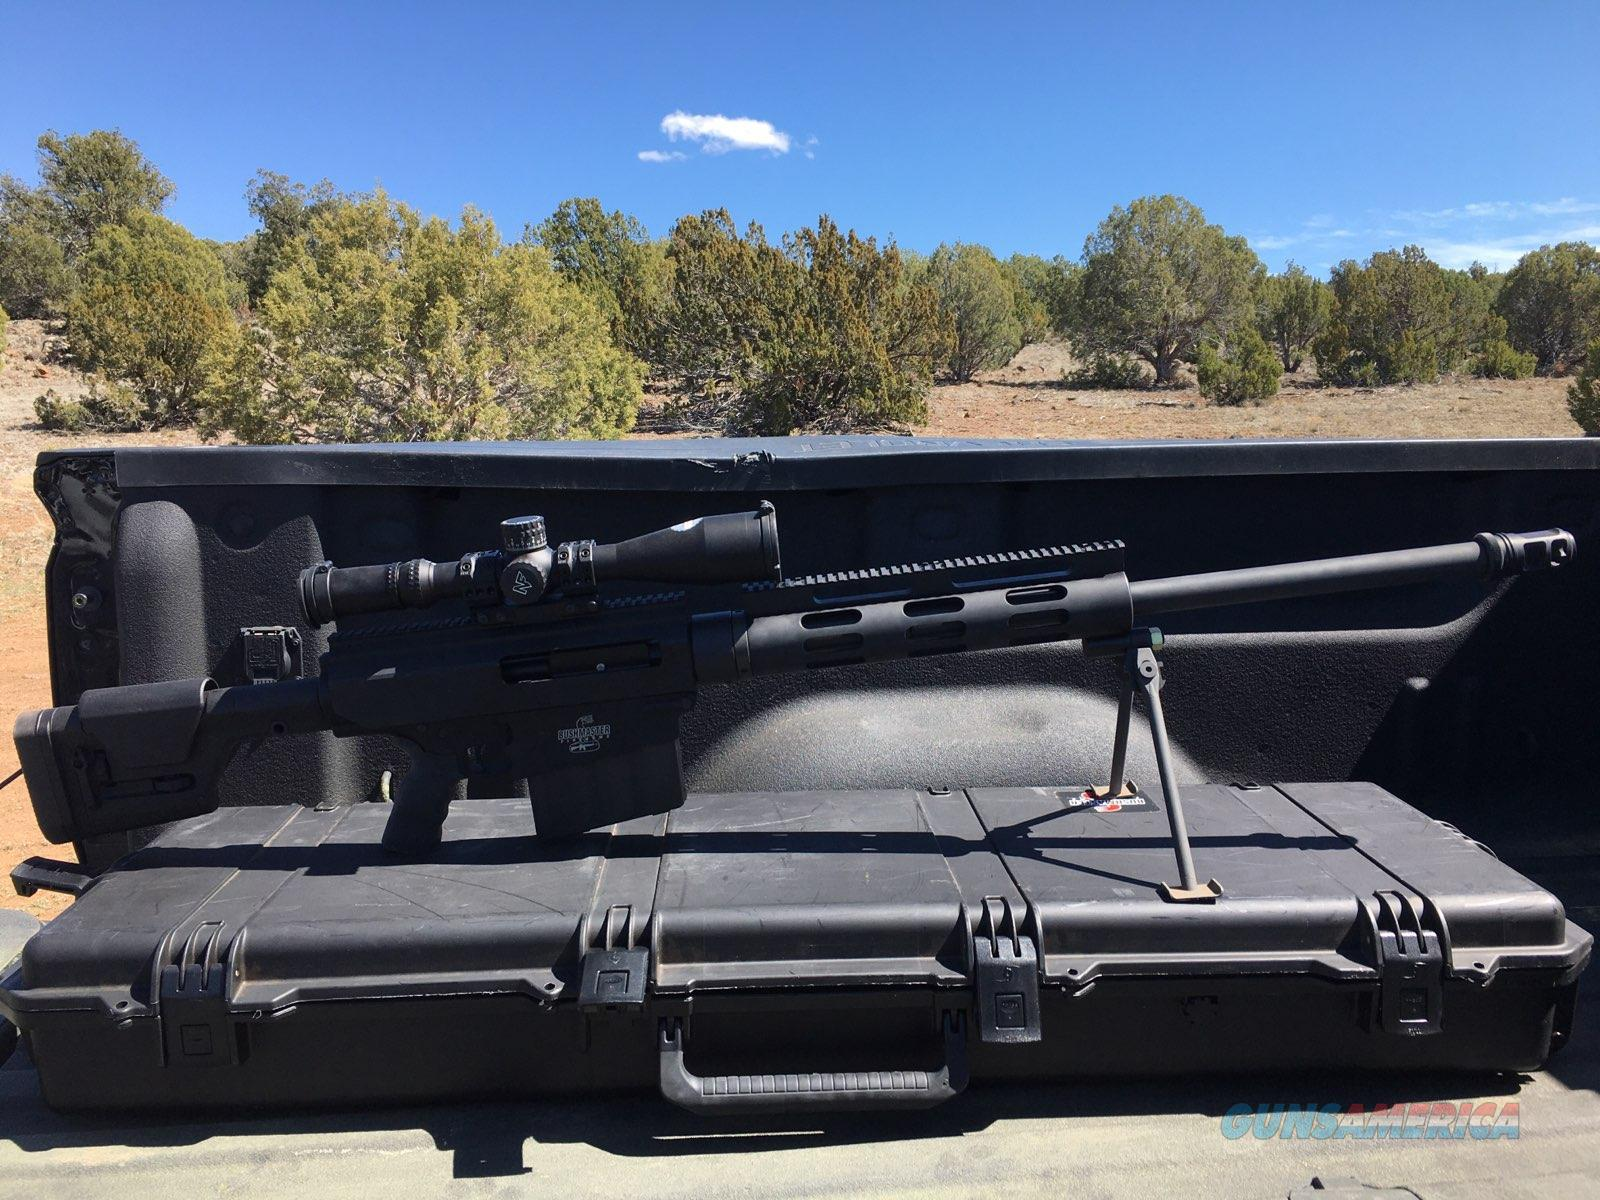 Bushmaster BA50 50 BMG  Guns > Rifles > Bushmaster Rifles > Complete Rifles